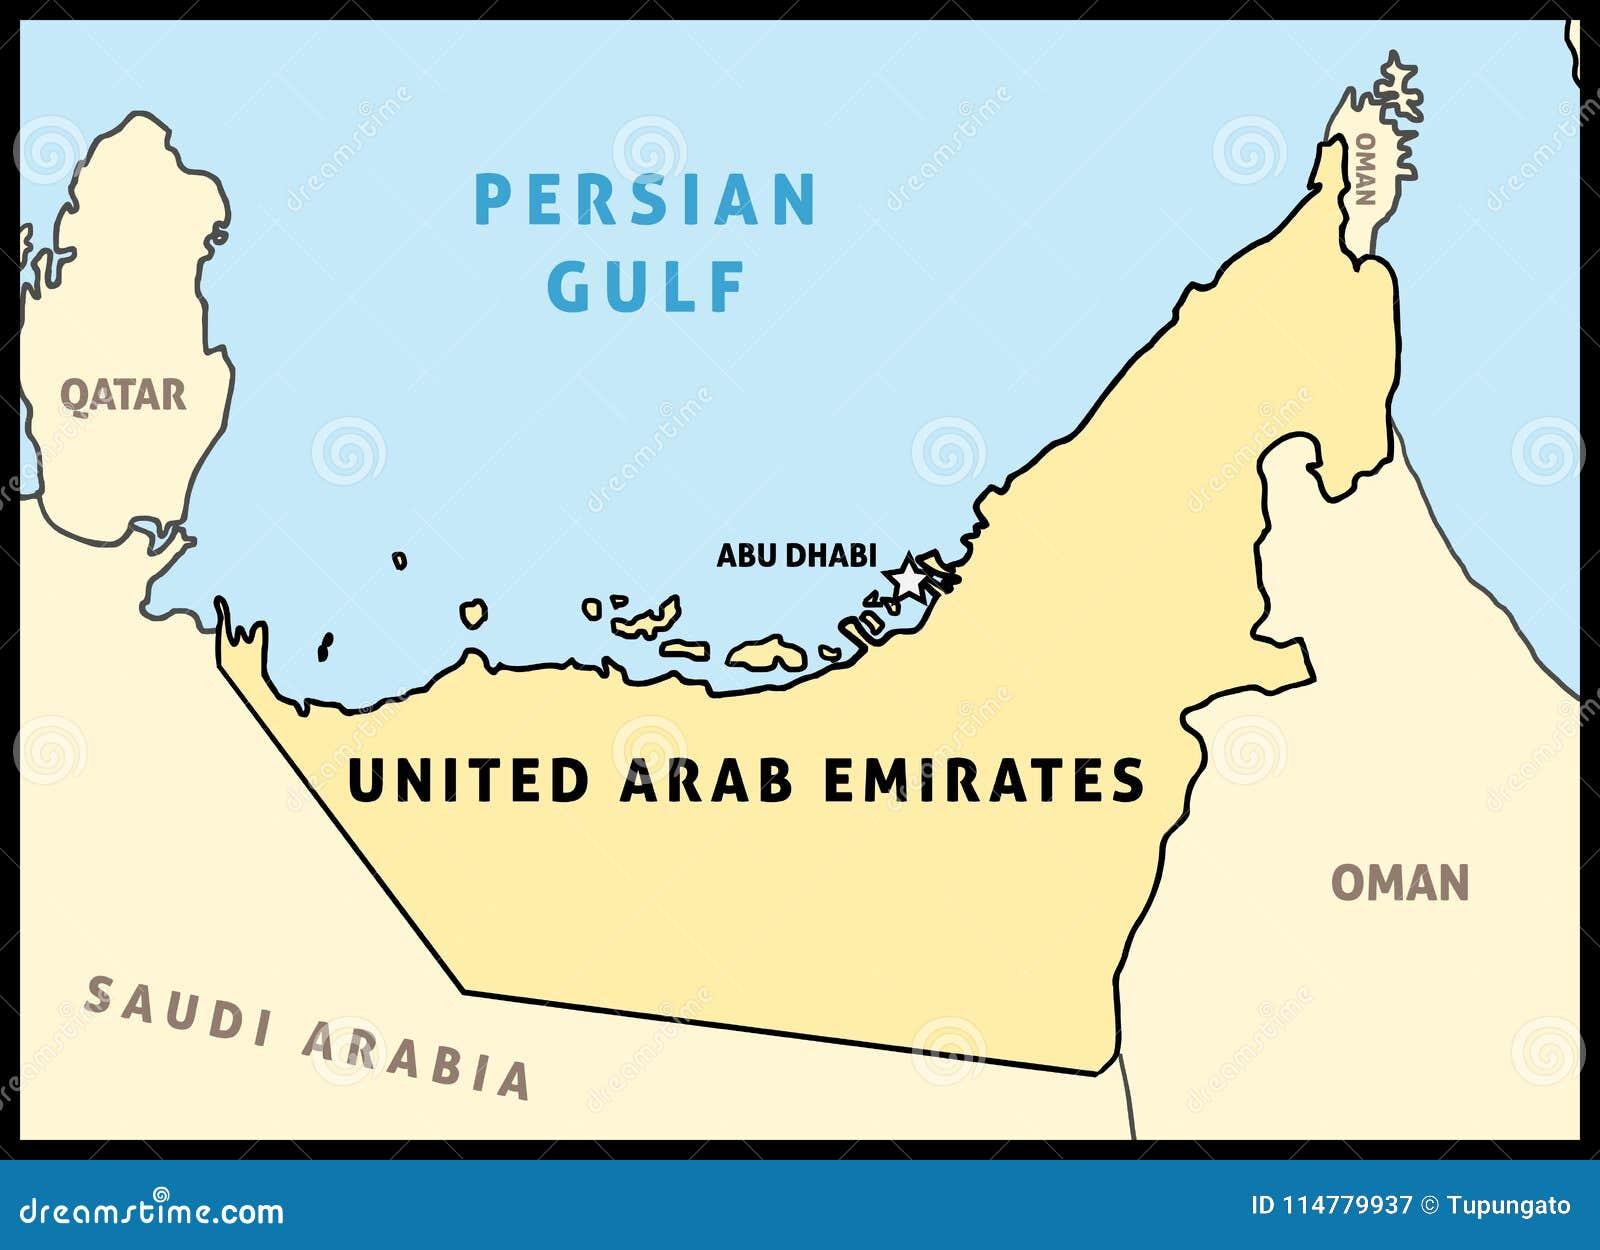 United Arab Emirates map stock vector. Illustration of destination ...